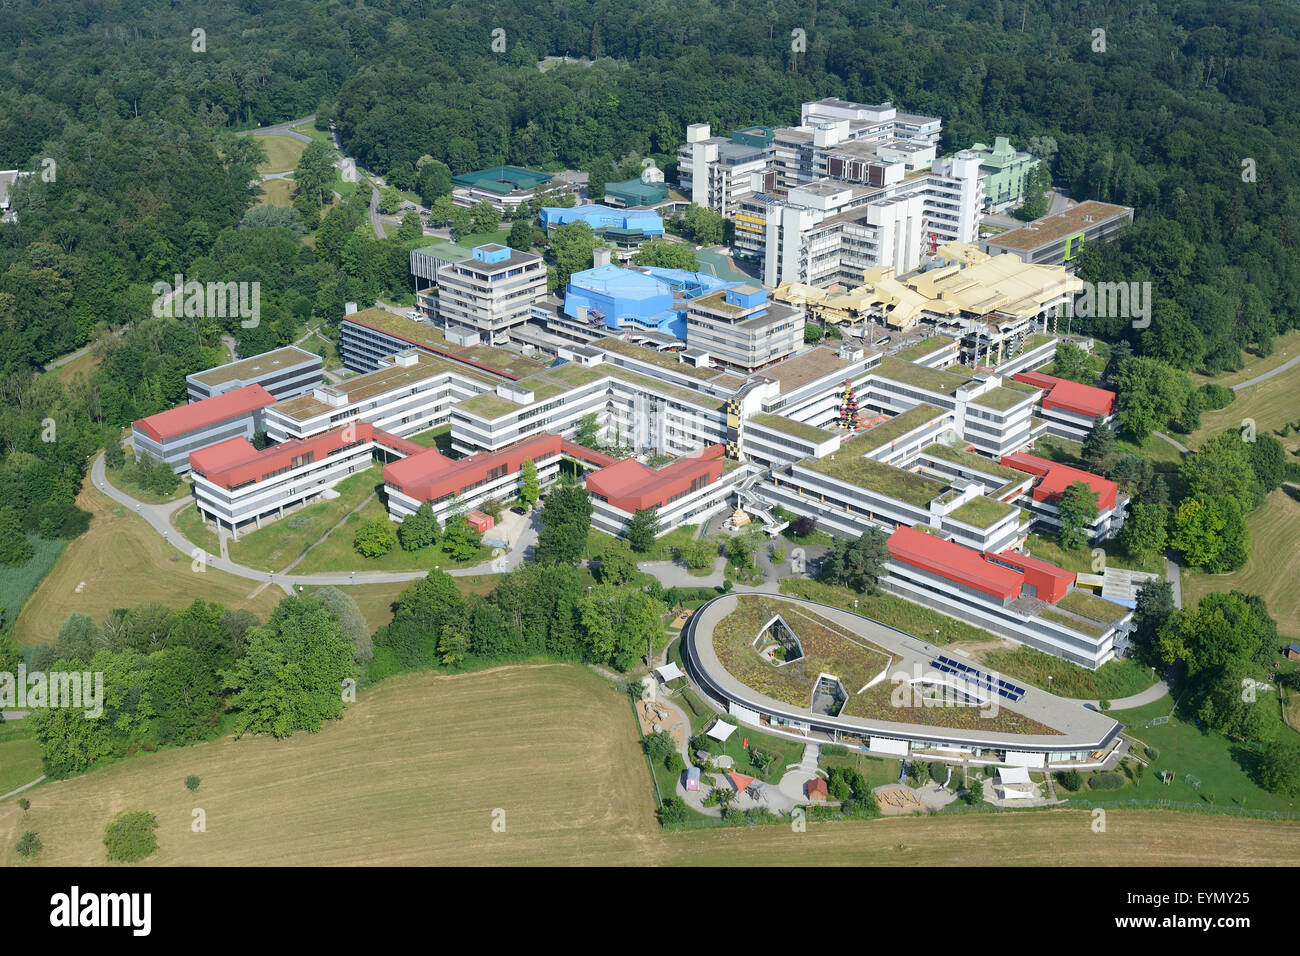 UNIVERSITY OF KONSTANZ (aerial view). Konstanz, Baden-Wurttemberg, Germany. - Stock Image